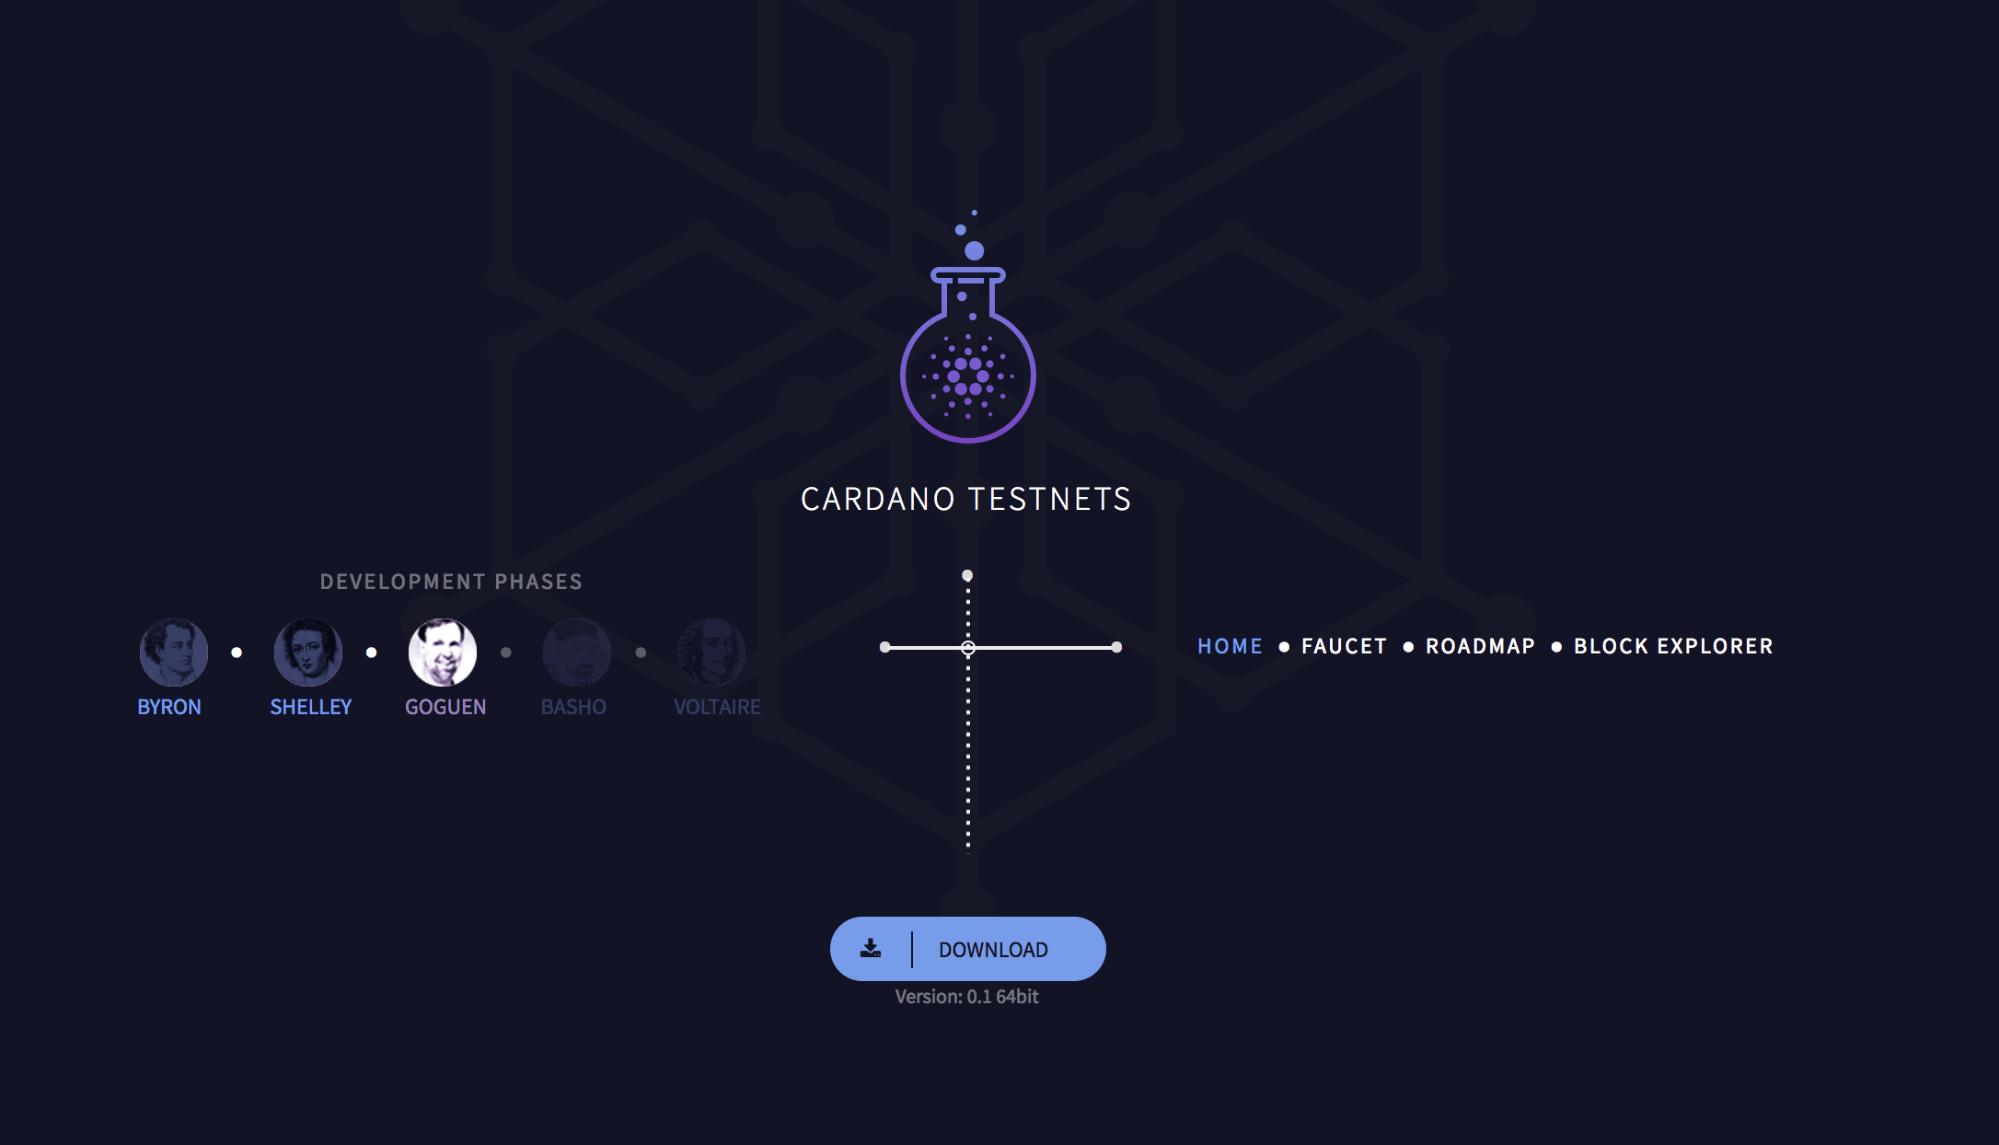 Cardano Testnets website